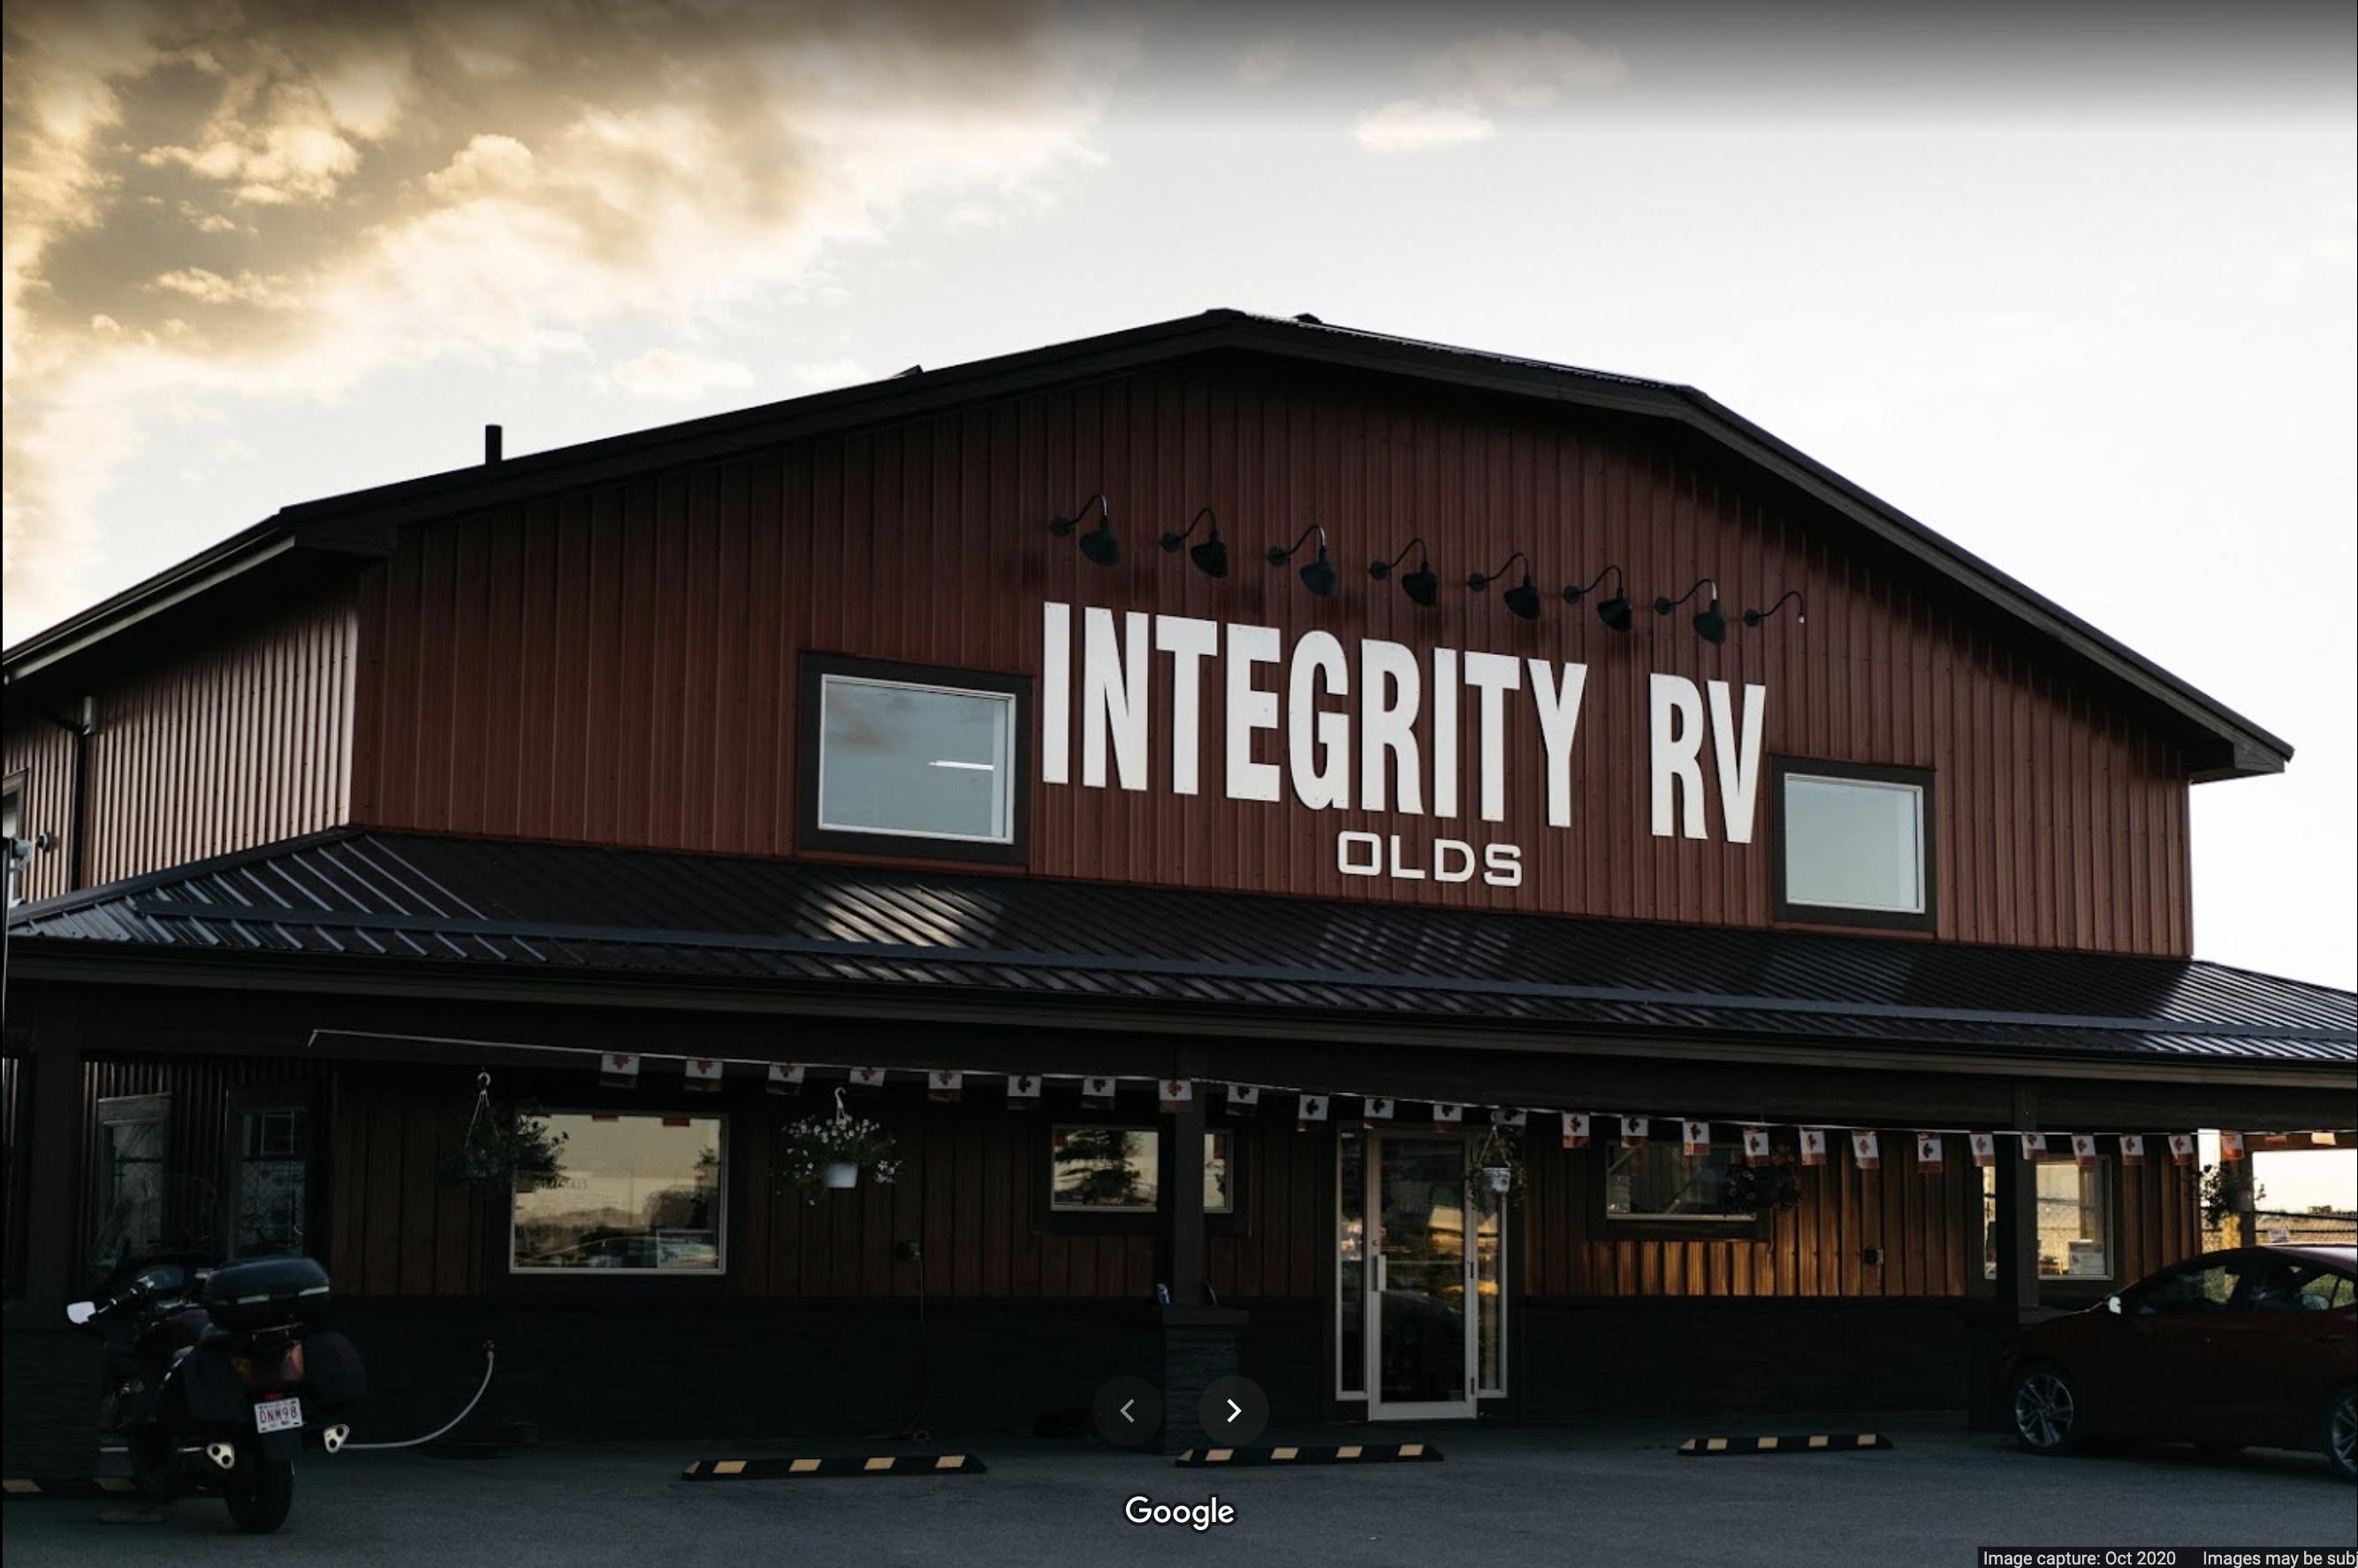 Integrity RV